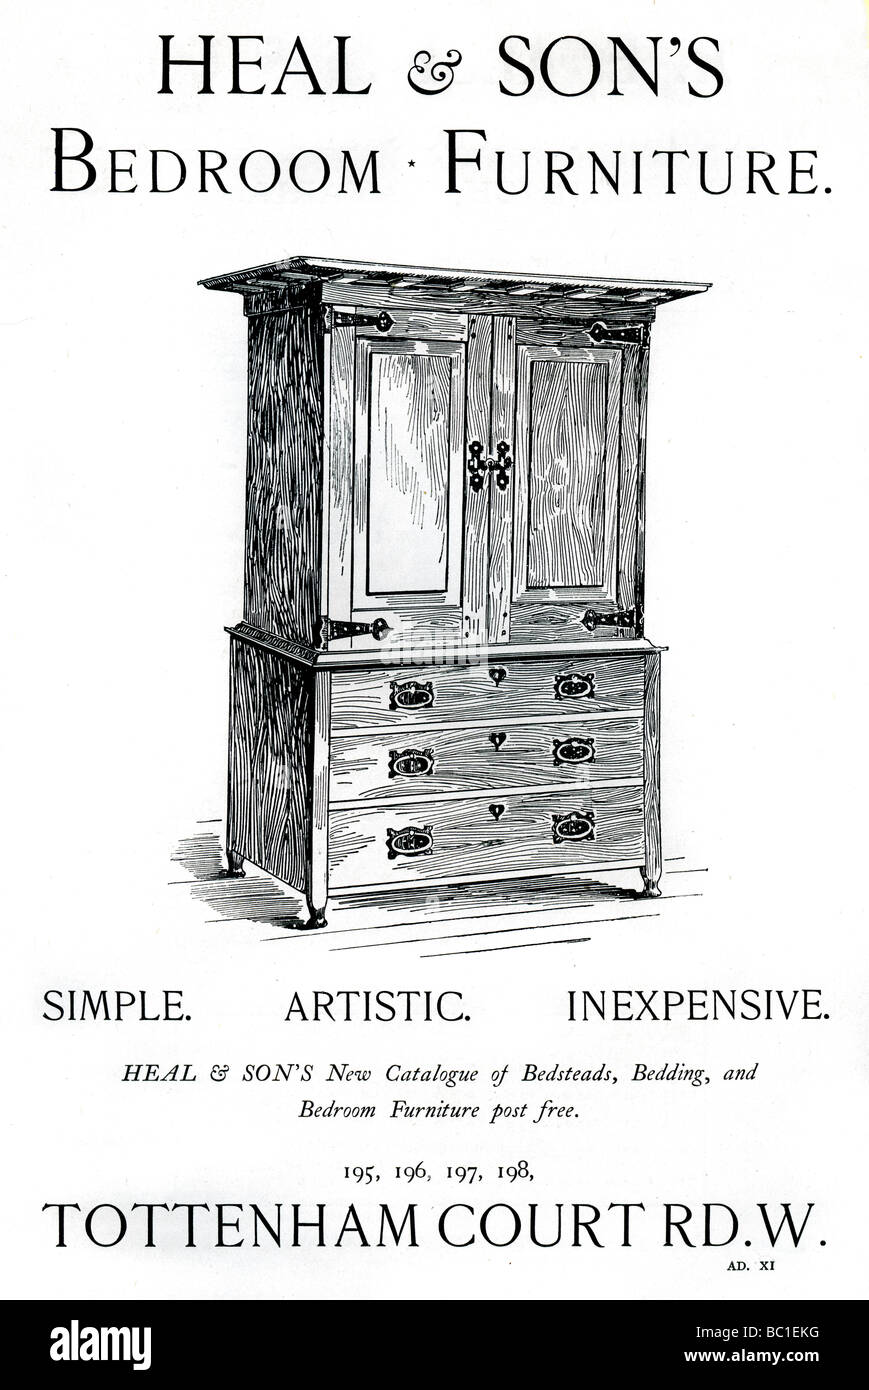 Furniture advertisement stock photos furniture for Furniture tottenham court road